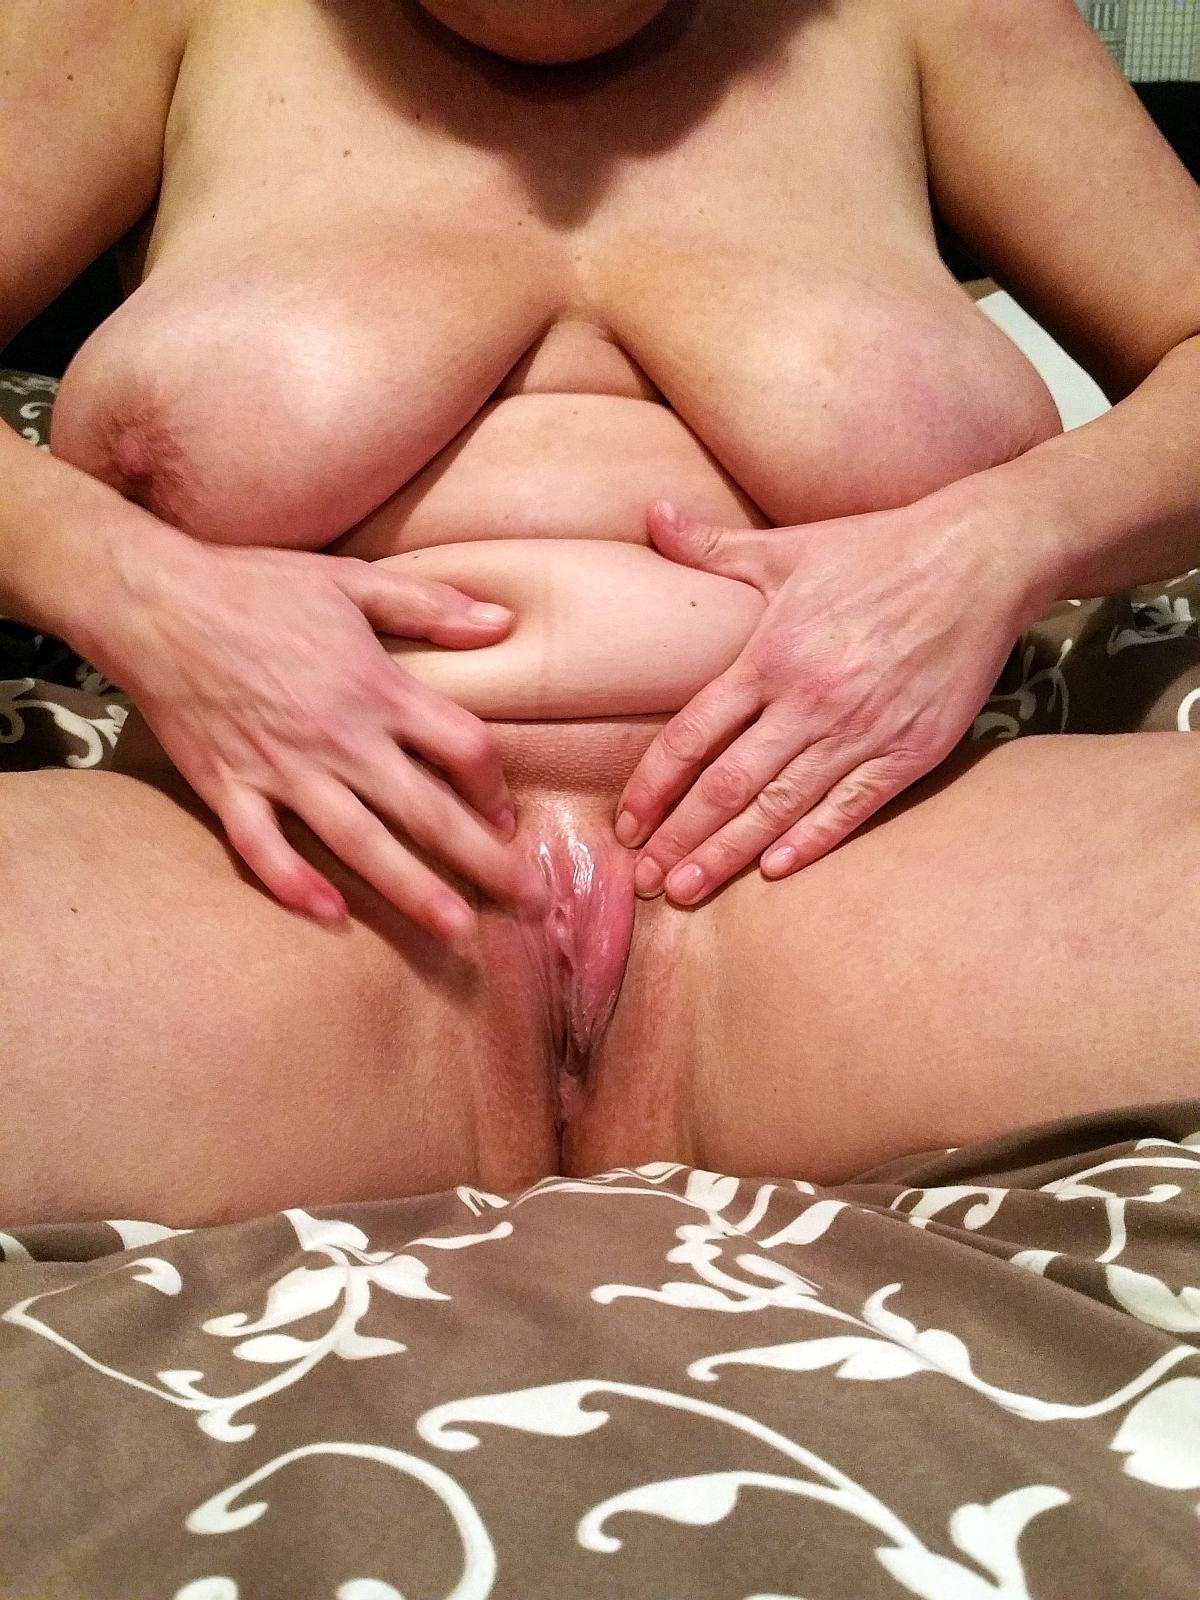 hängetitten anal